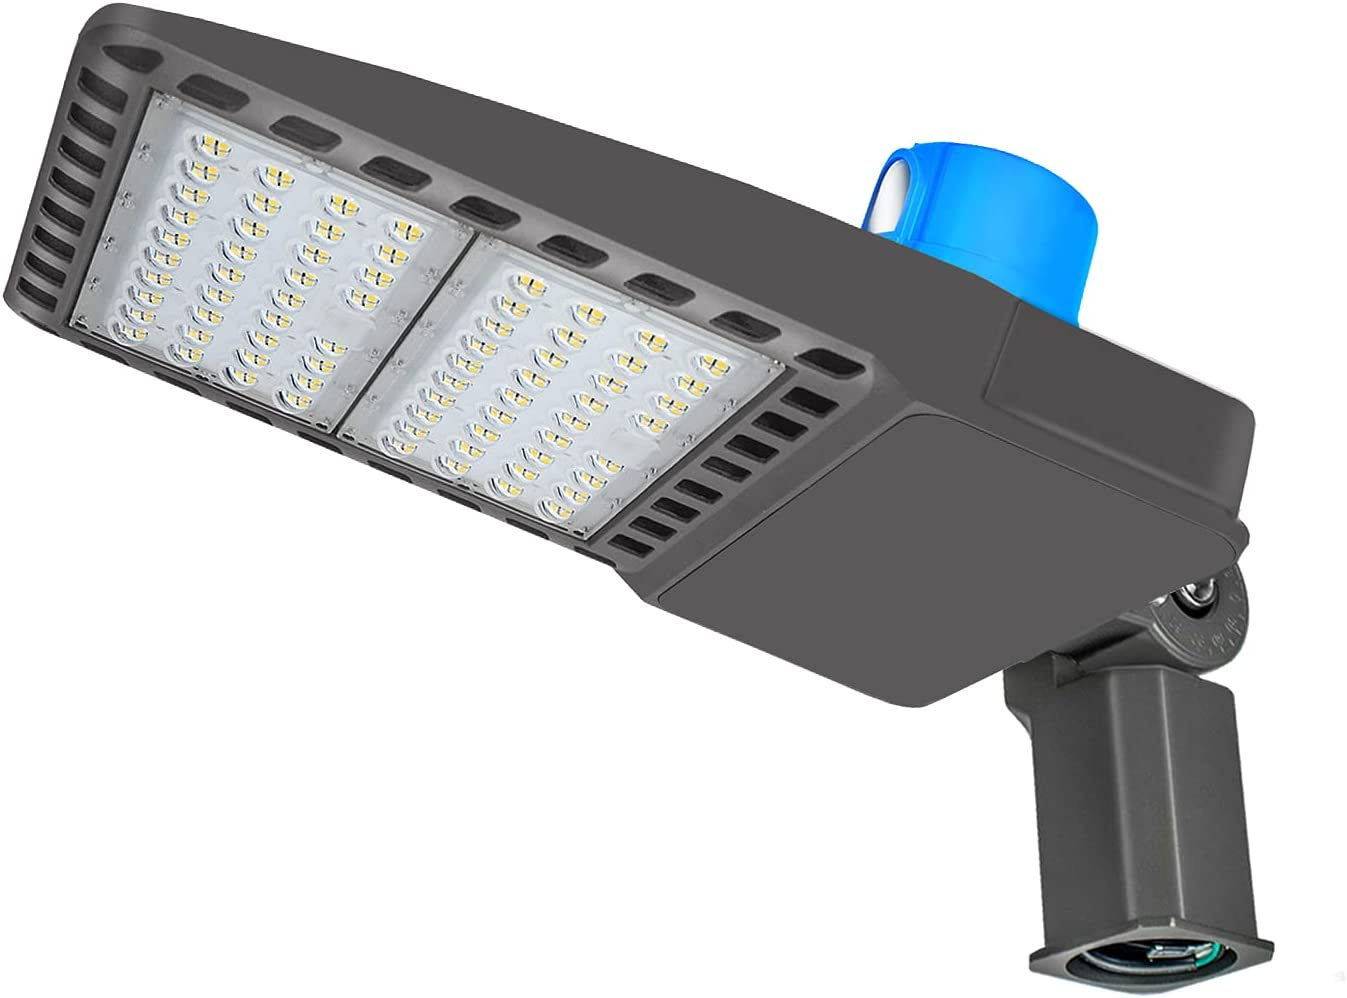 Details about  /Street Parking Lamp Energy Saving Rechargeable Led Light 90W 220V-240V 2300Lm